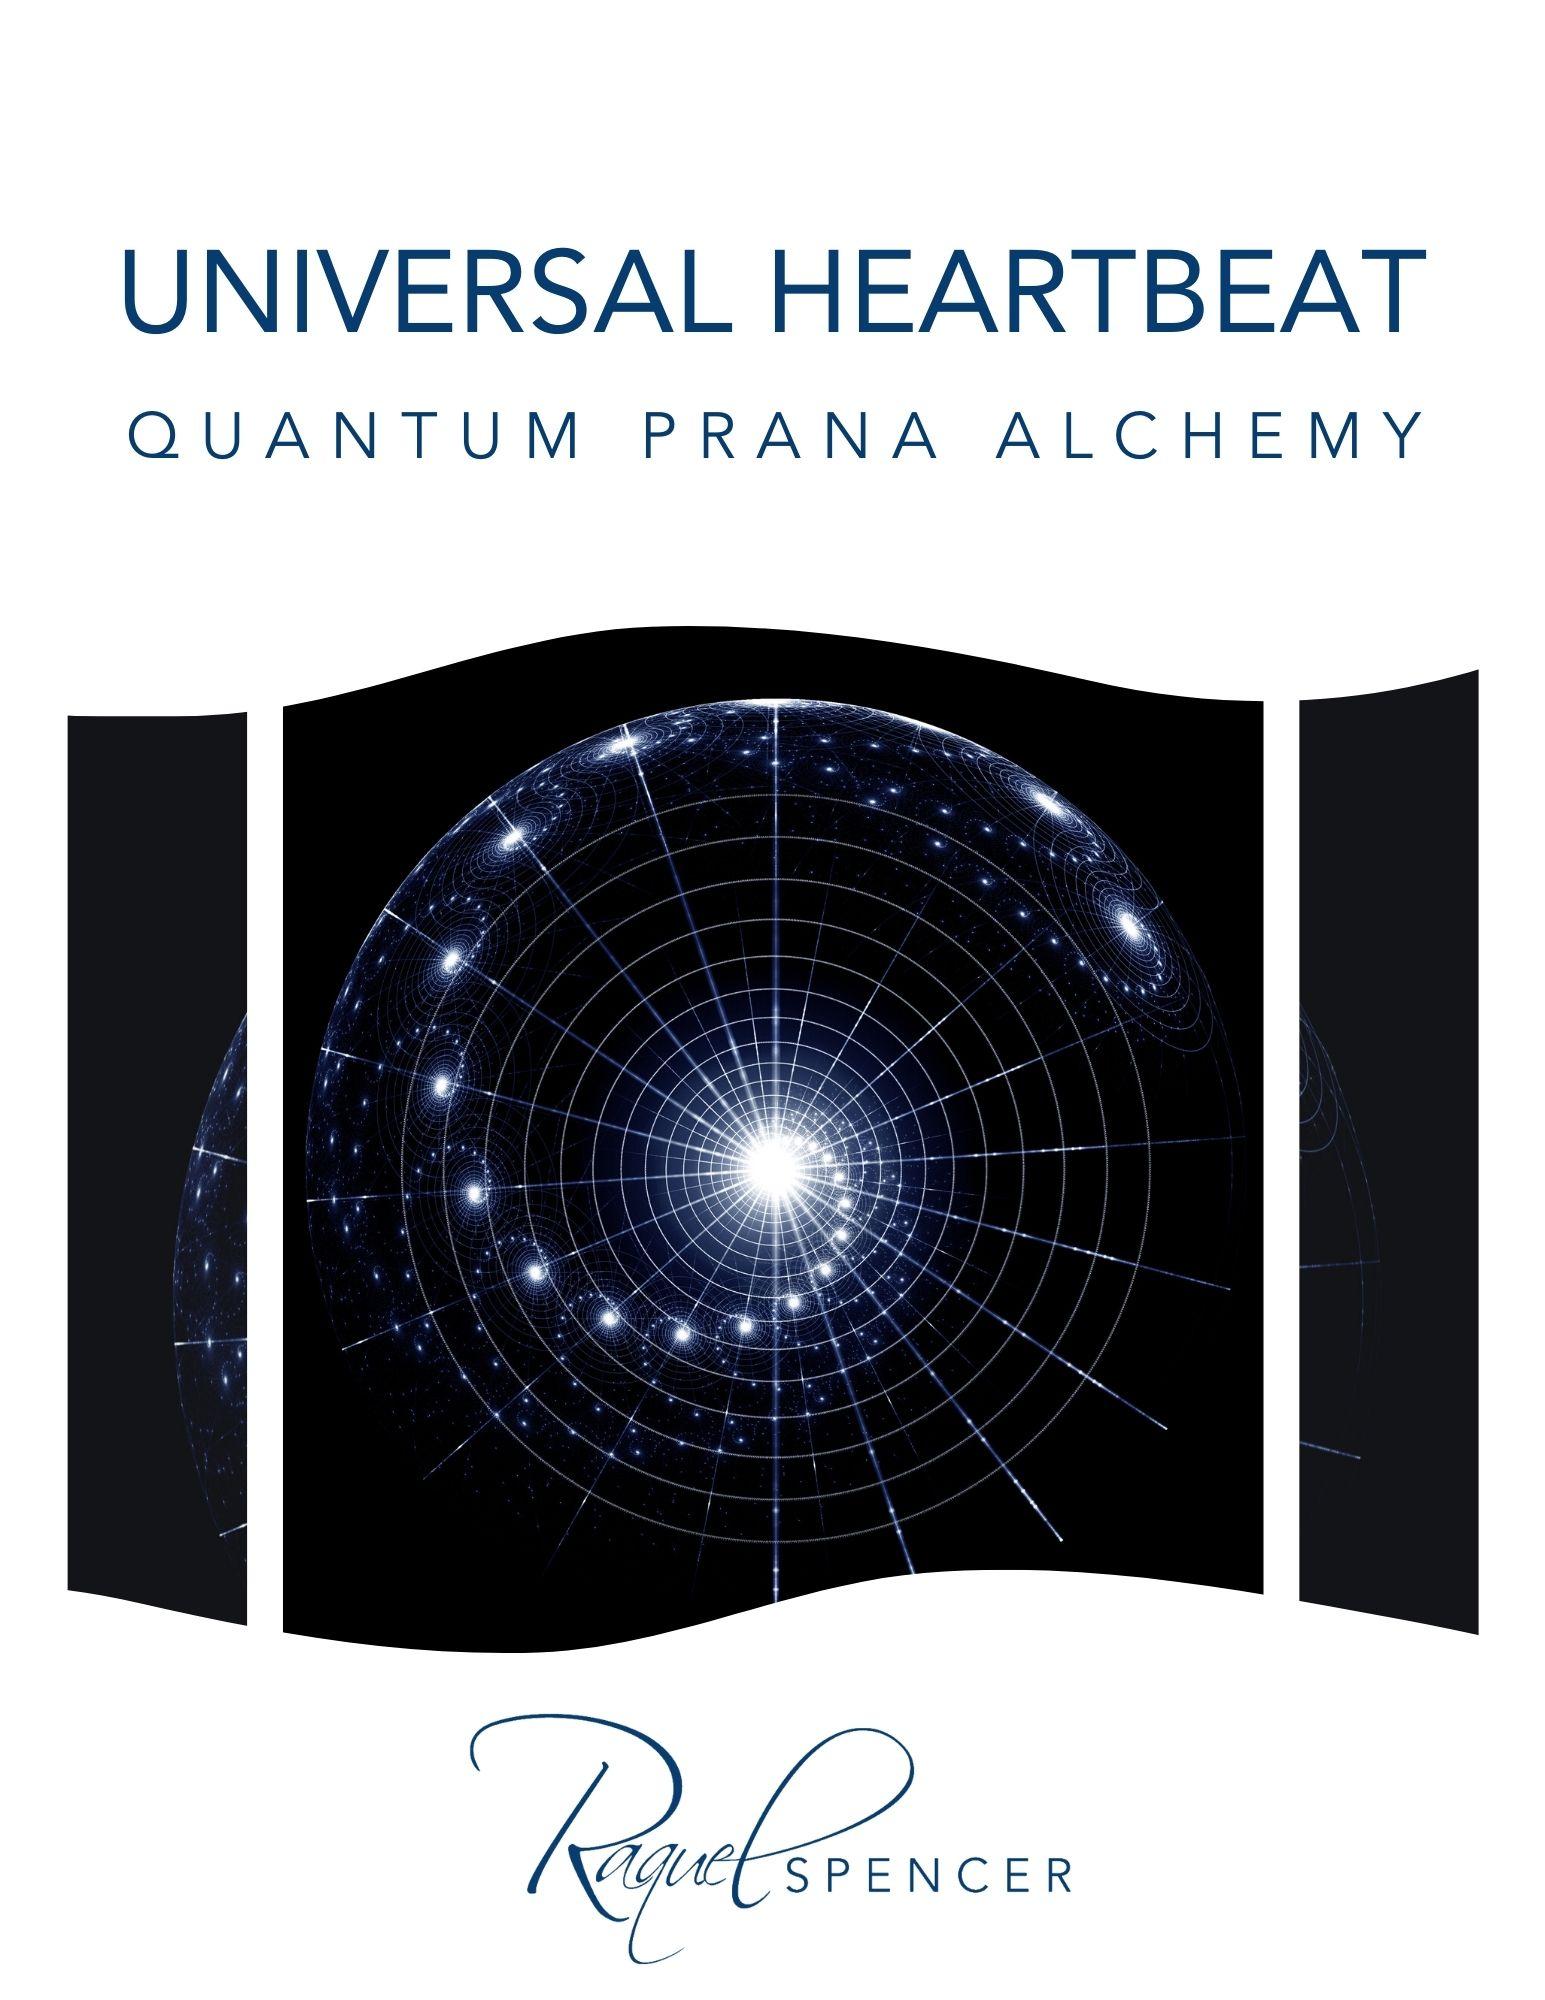 Universal Heartbeat - Quantum Prana Alchemy